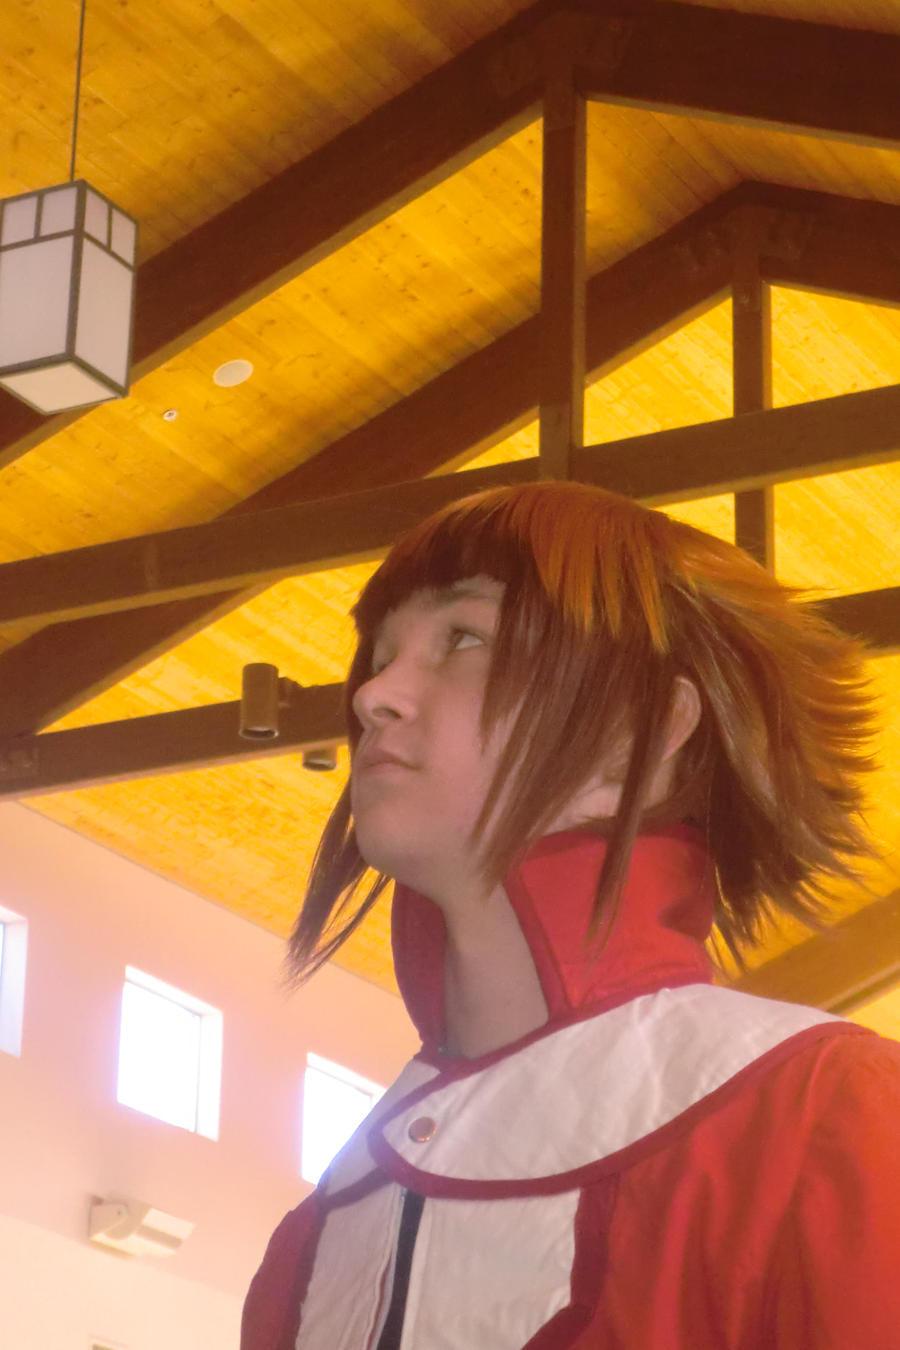 Jaden Yuki: Looking Forward by Taikxo